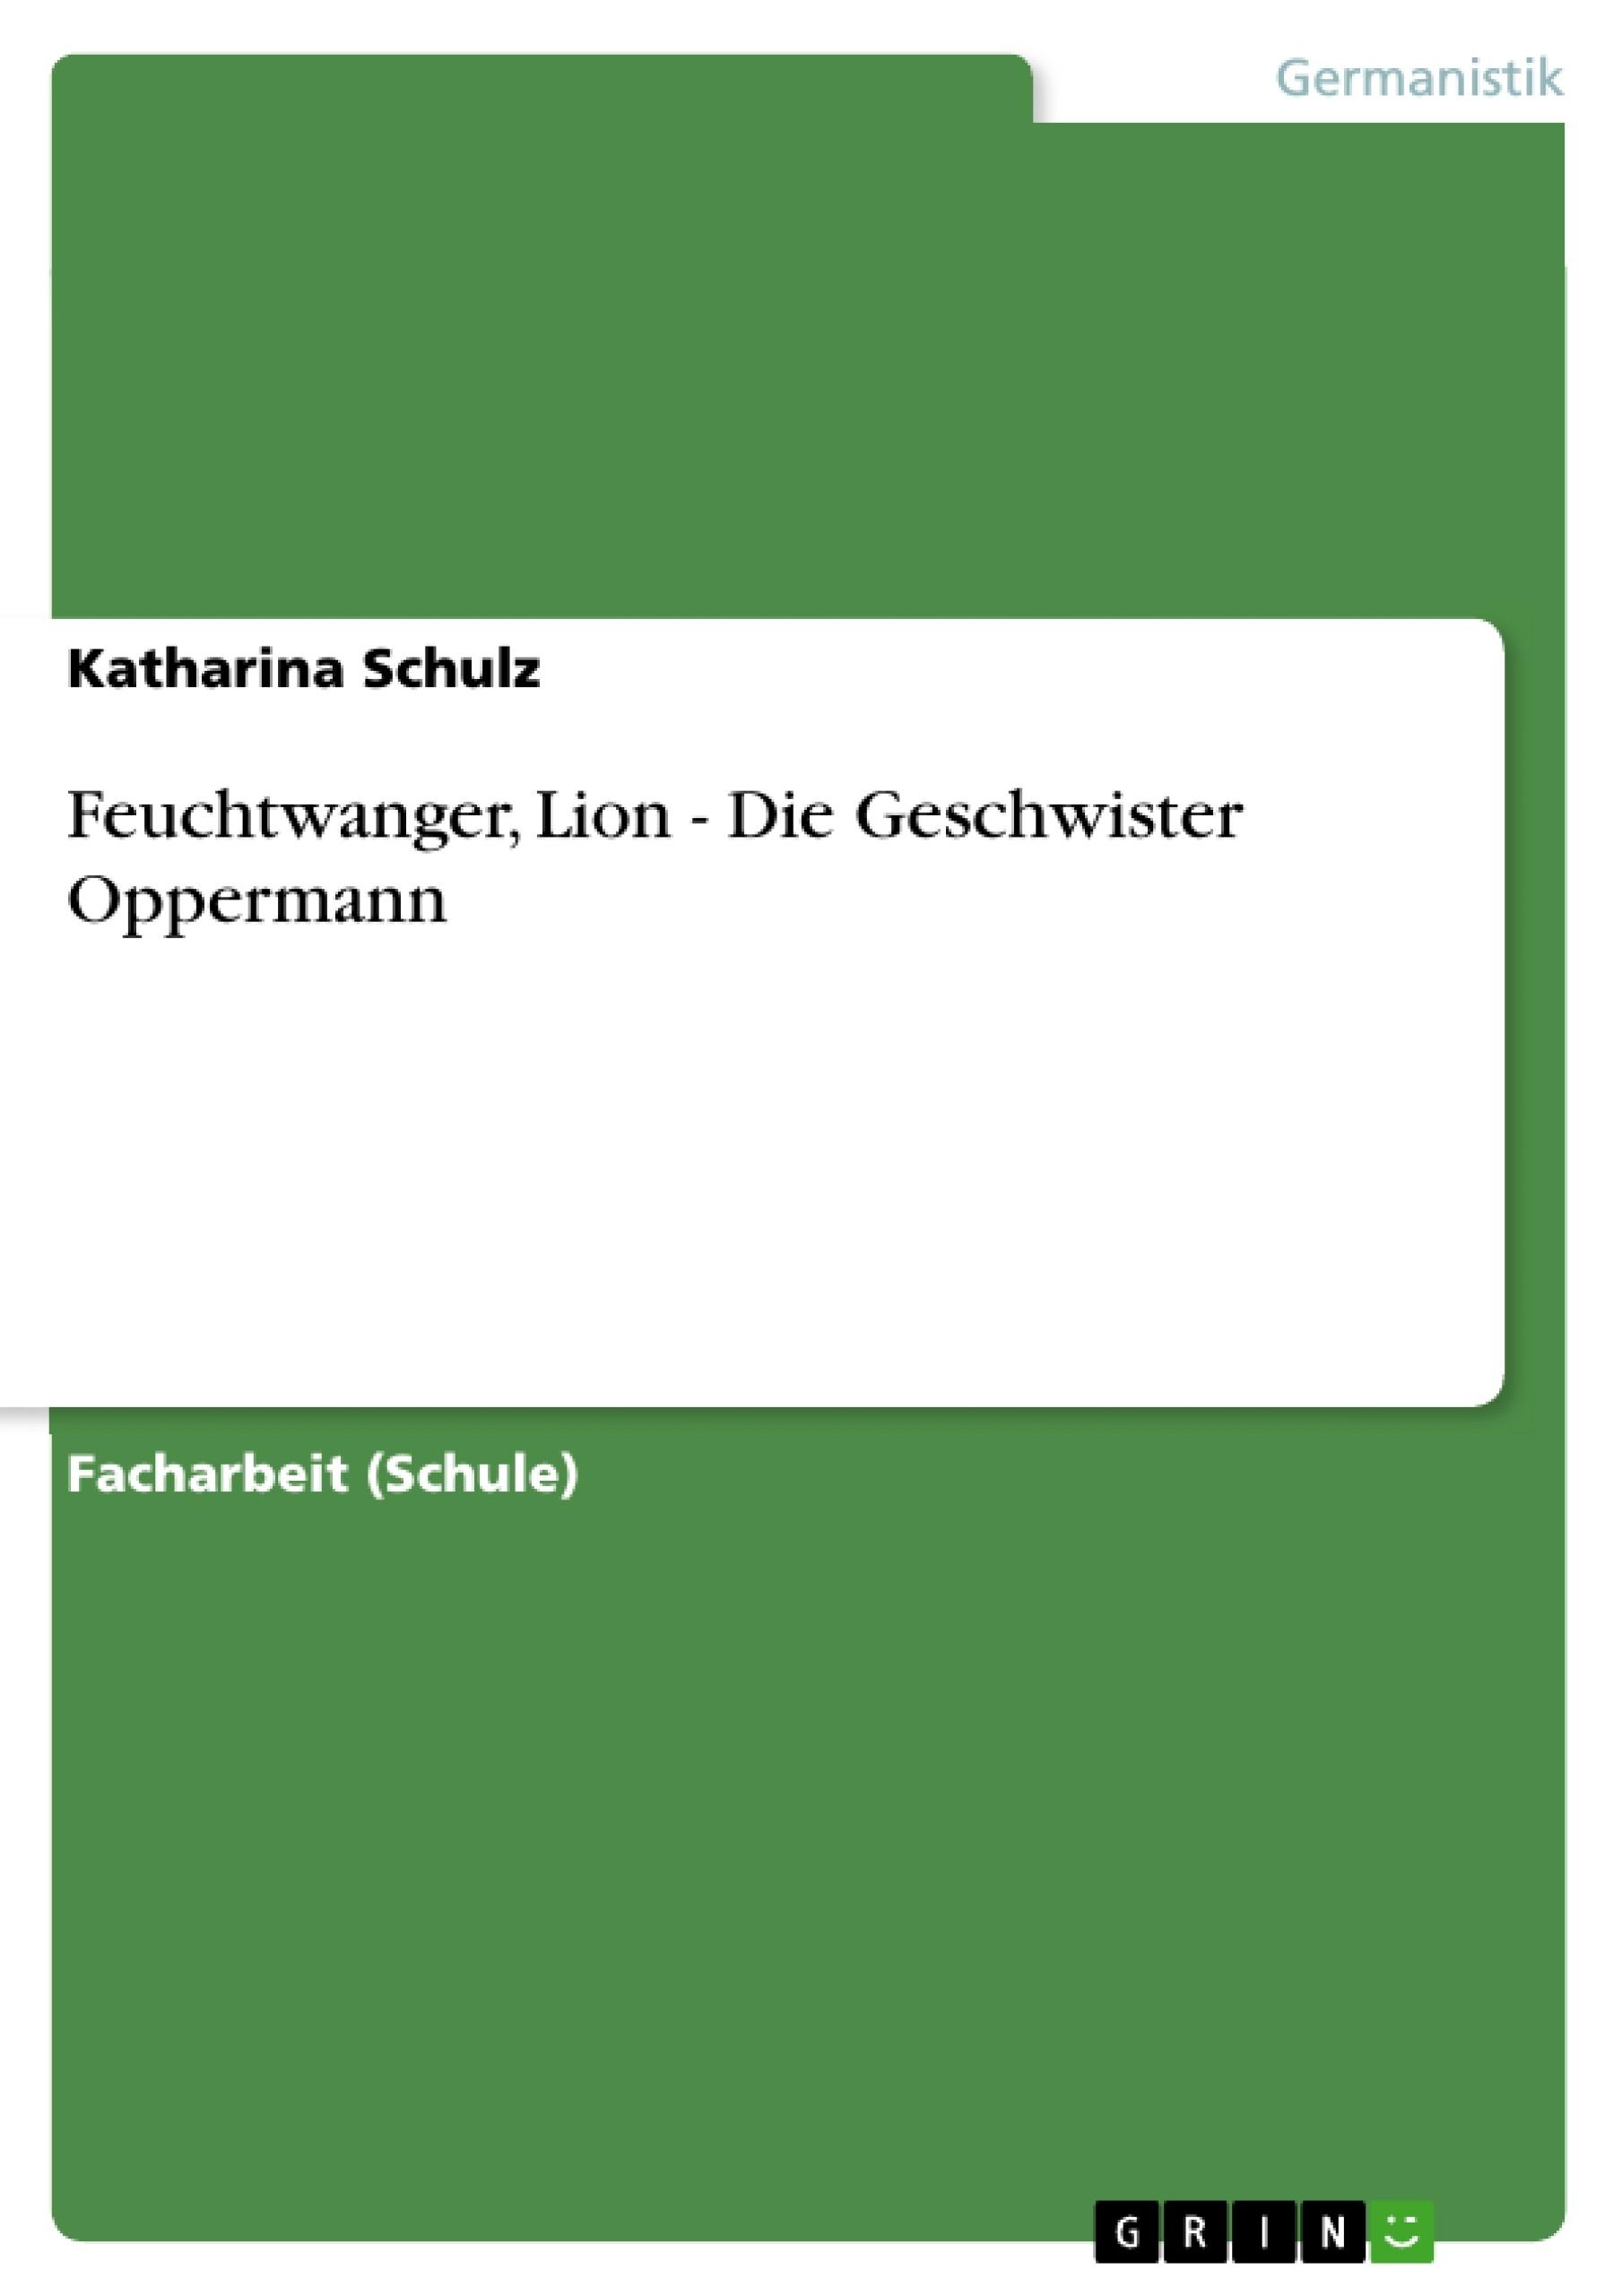 Titel: Feuchtwanger, Lion - Die Geschwister Oppermann